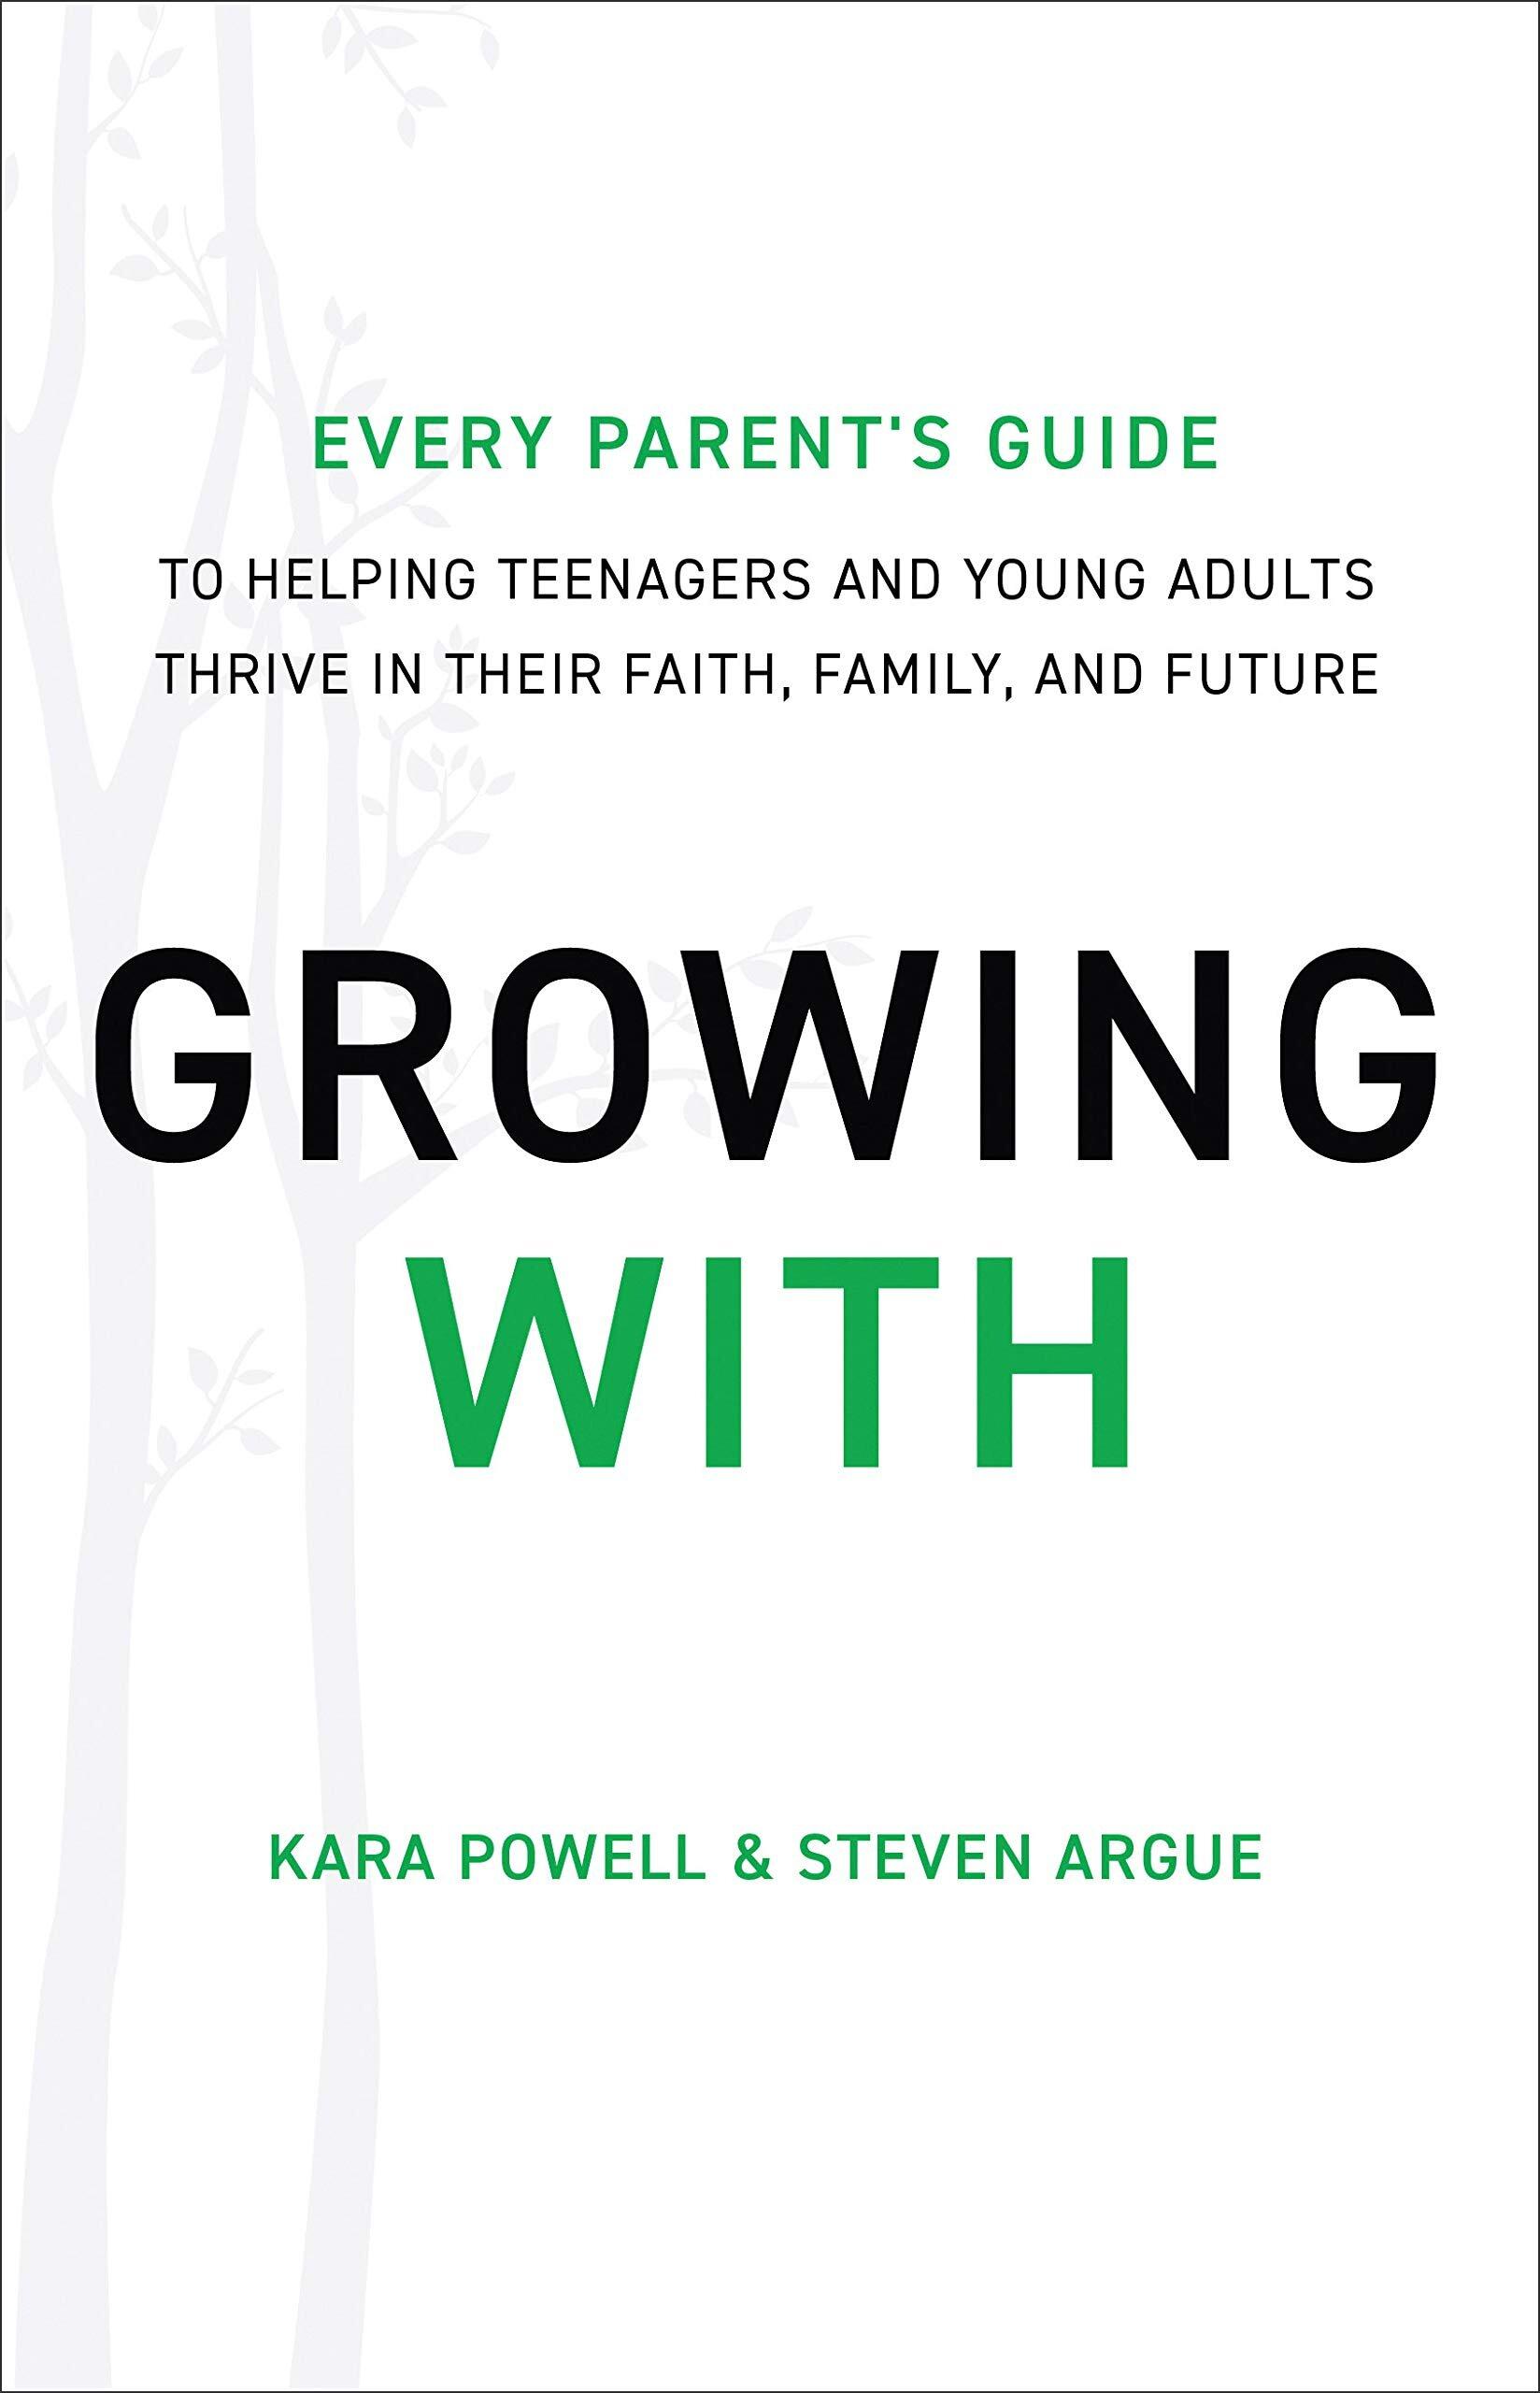 Growing With Kara Powell & Steven Argue  Orange   Amazon   Ibooks